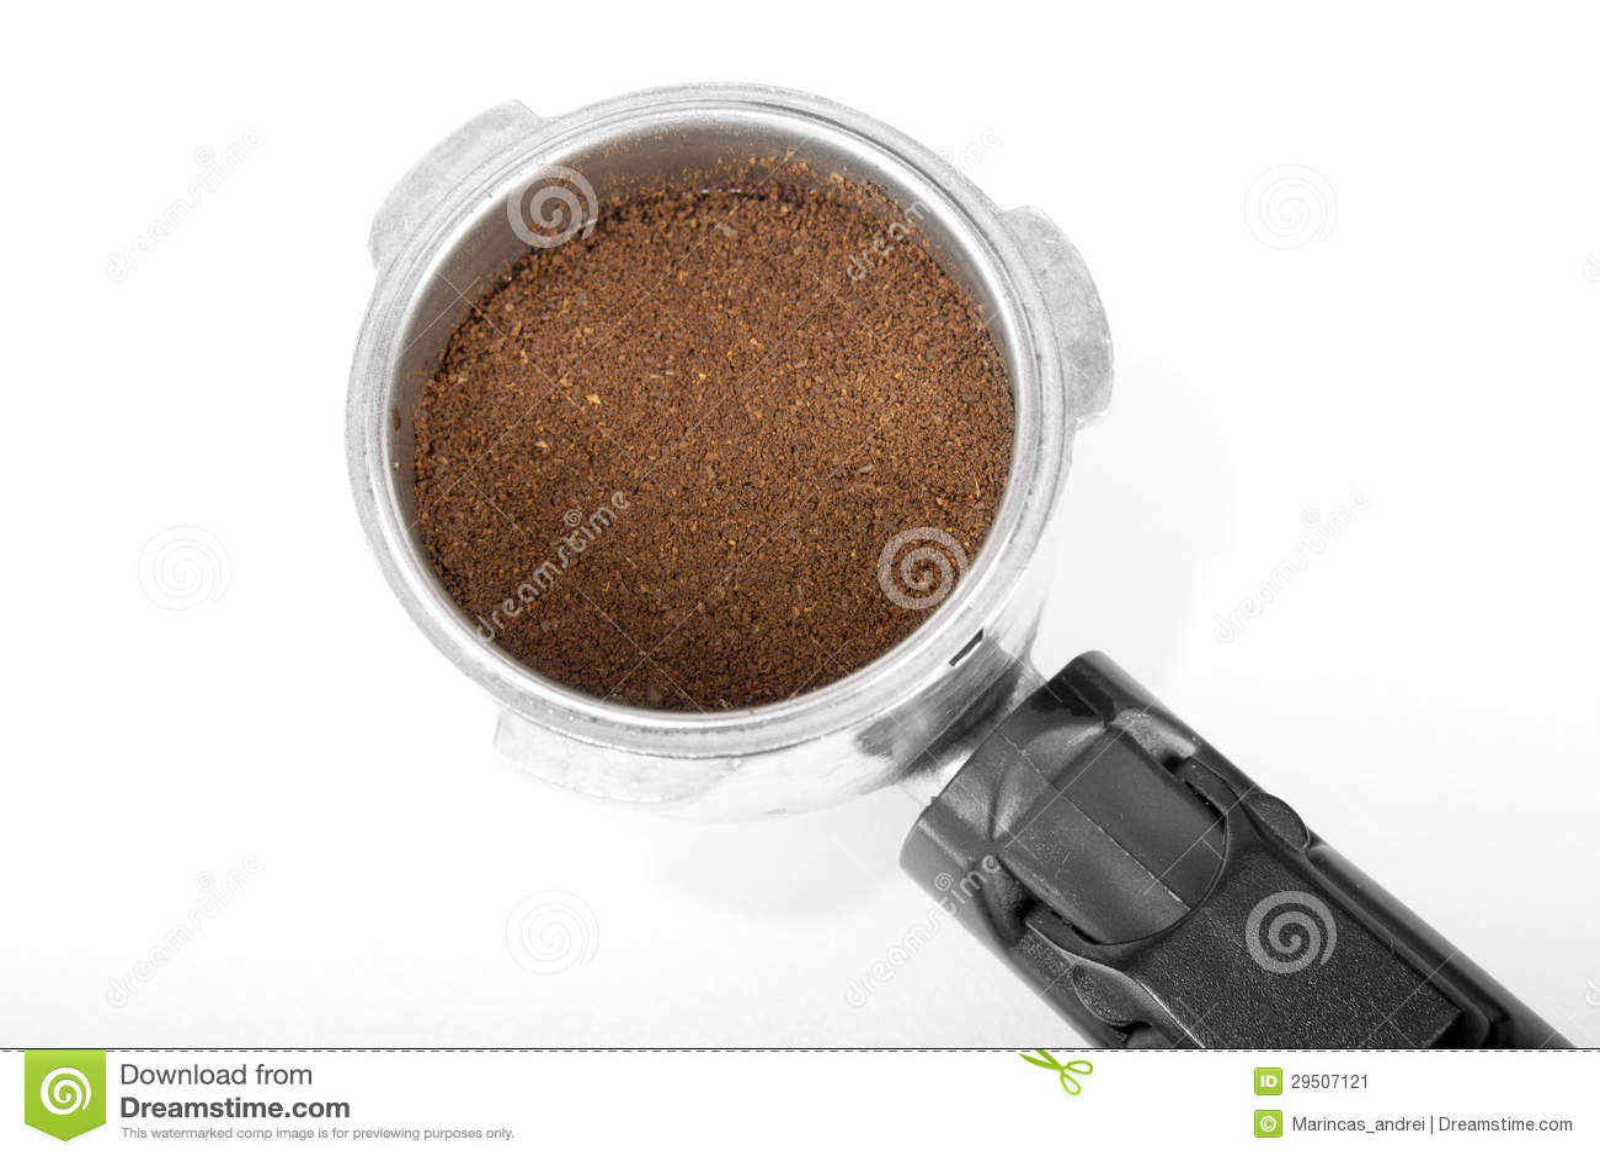 Espresso handle with coffee powder